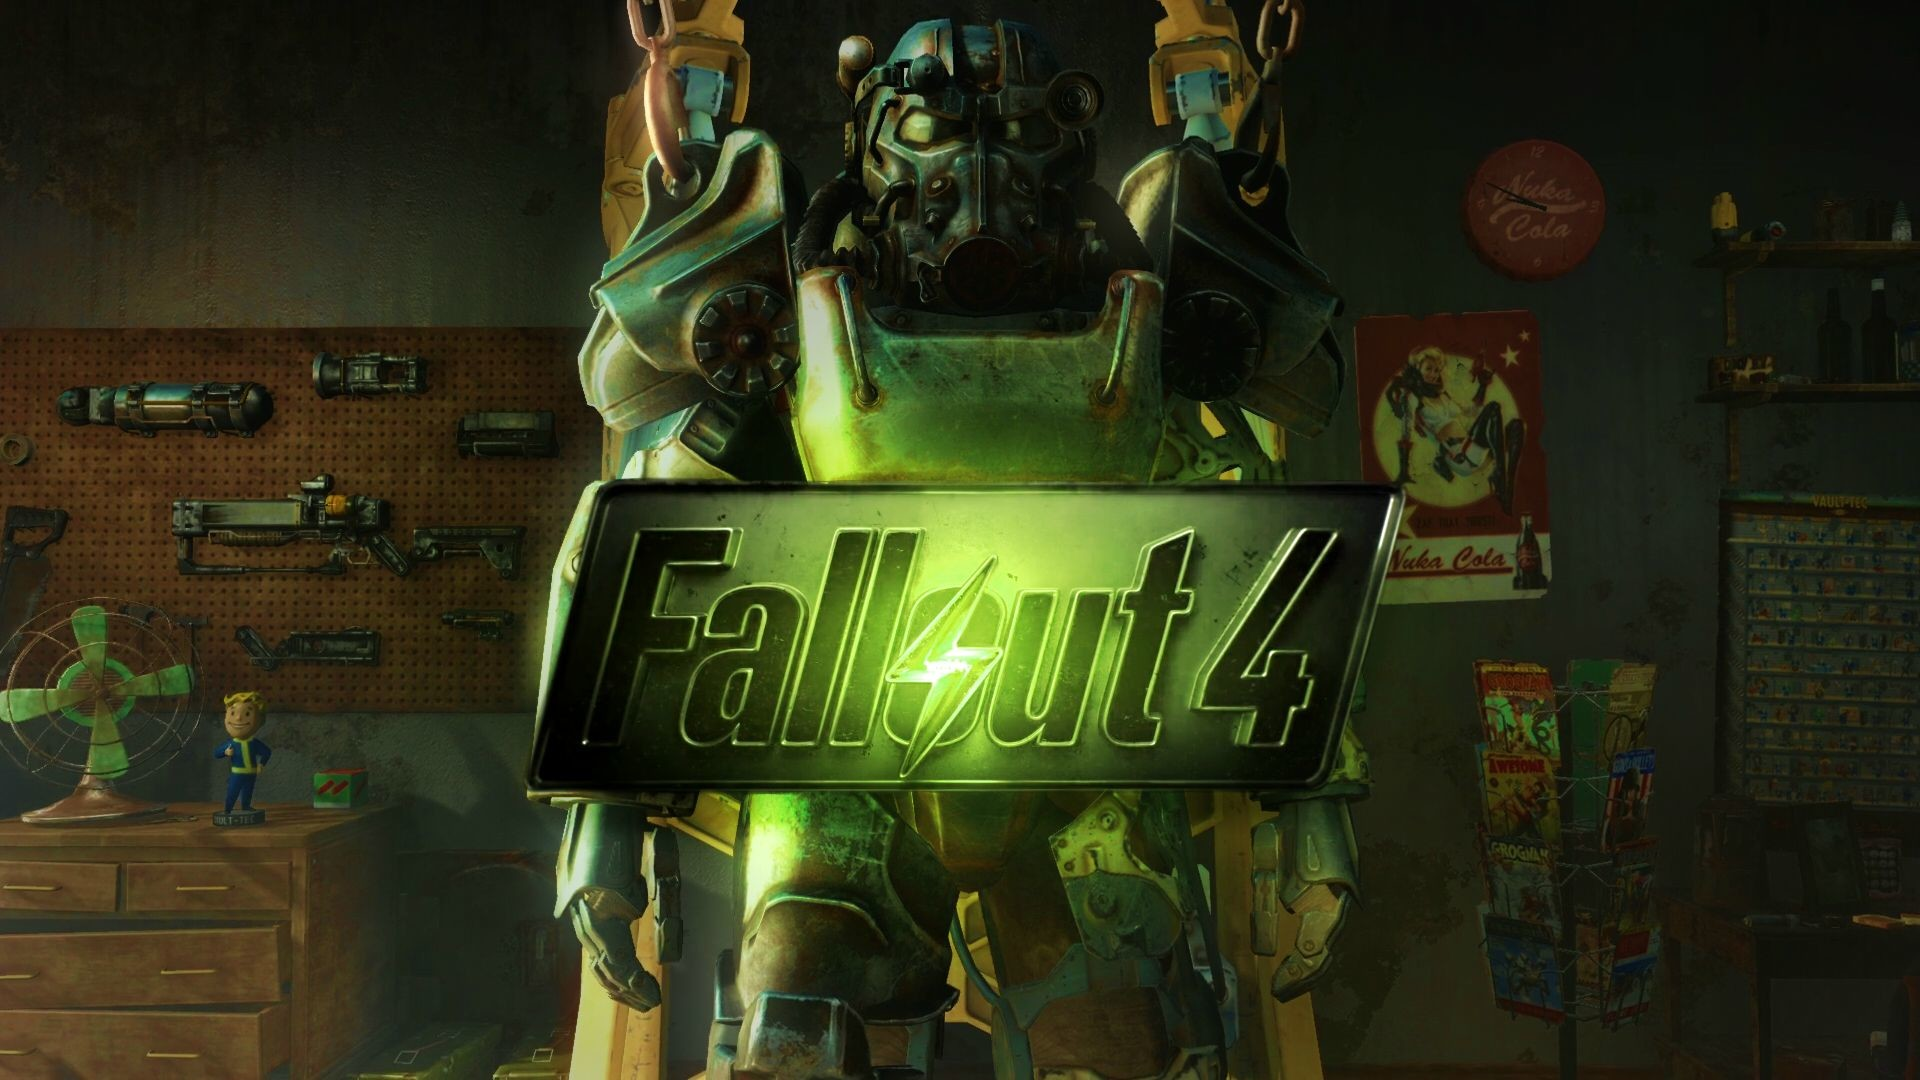 Fallout 4 Desktop Wallpaper Weapons back